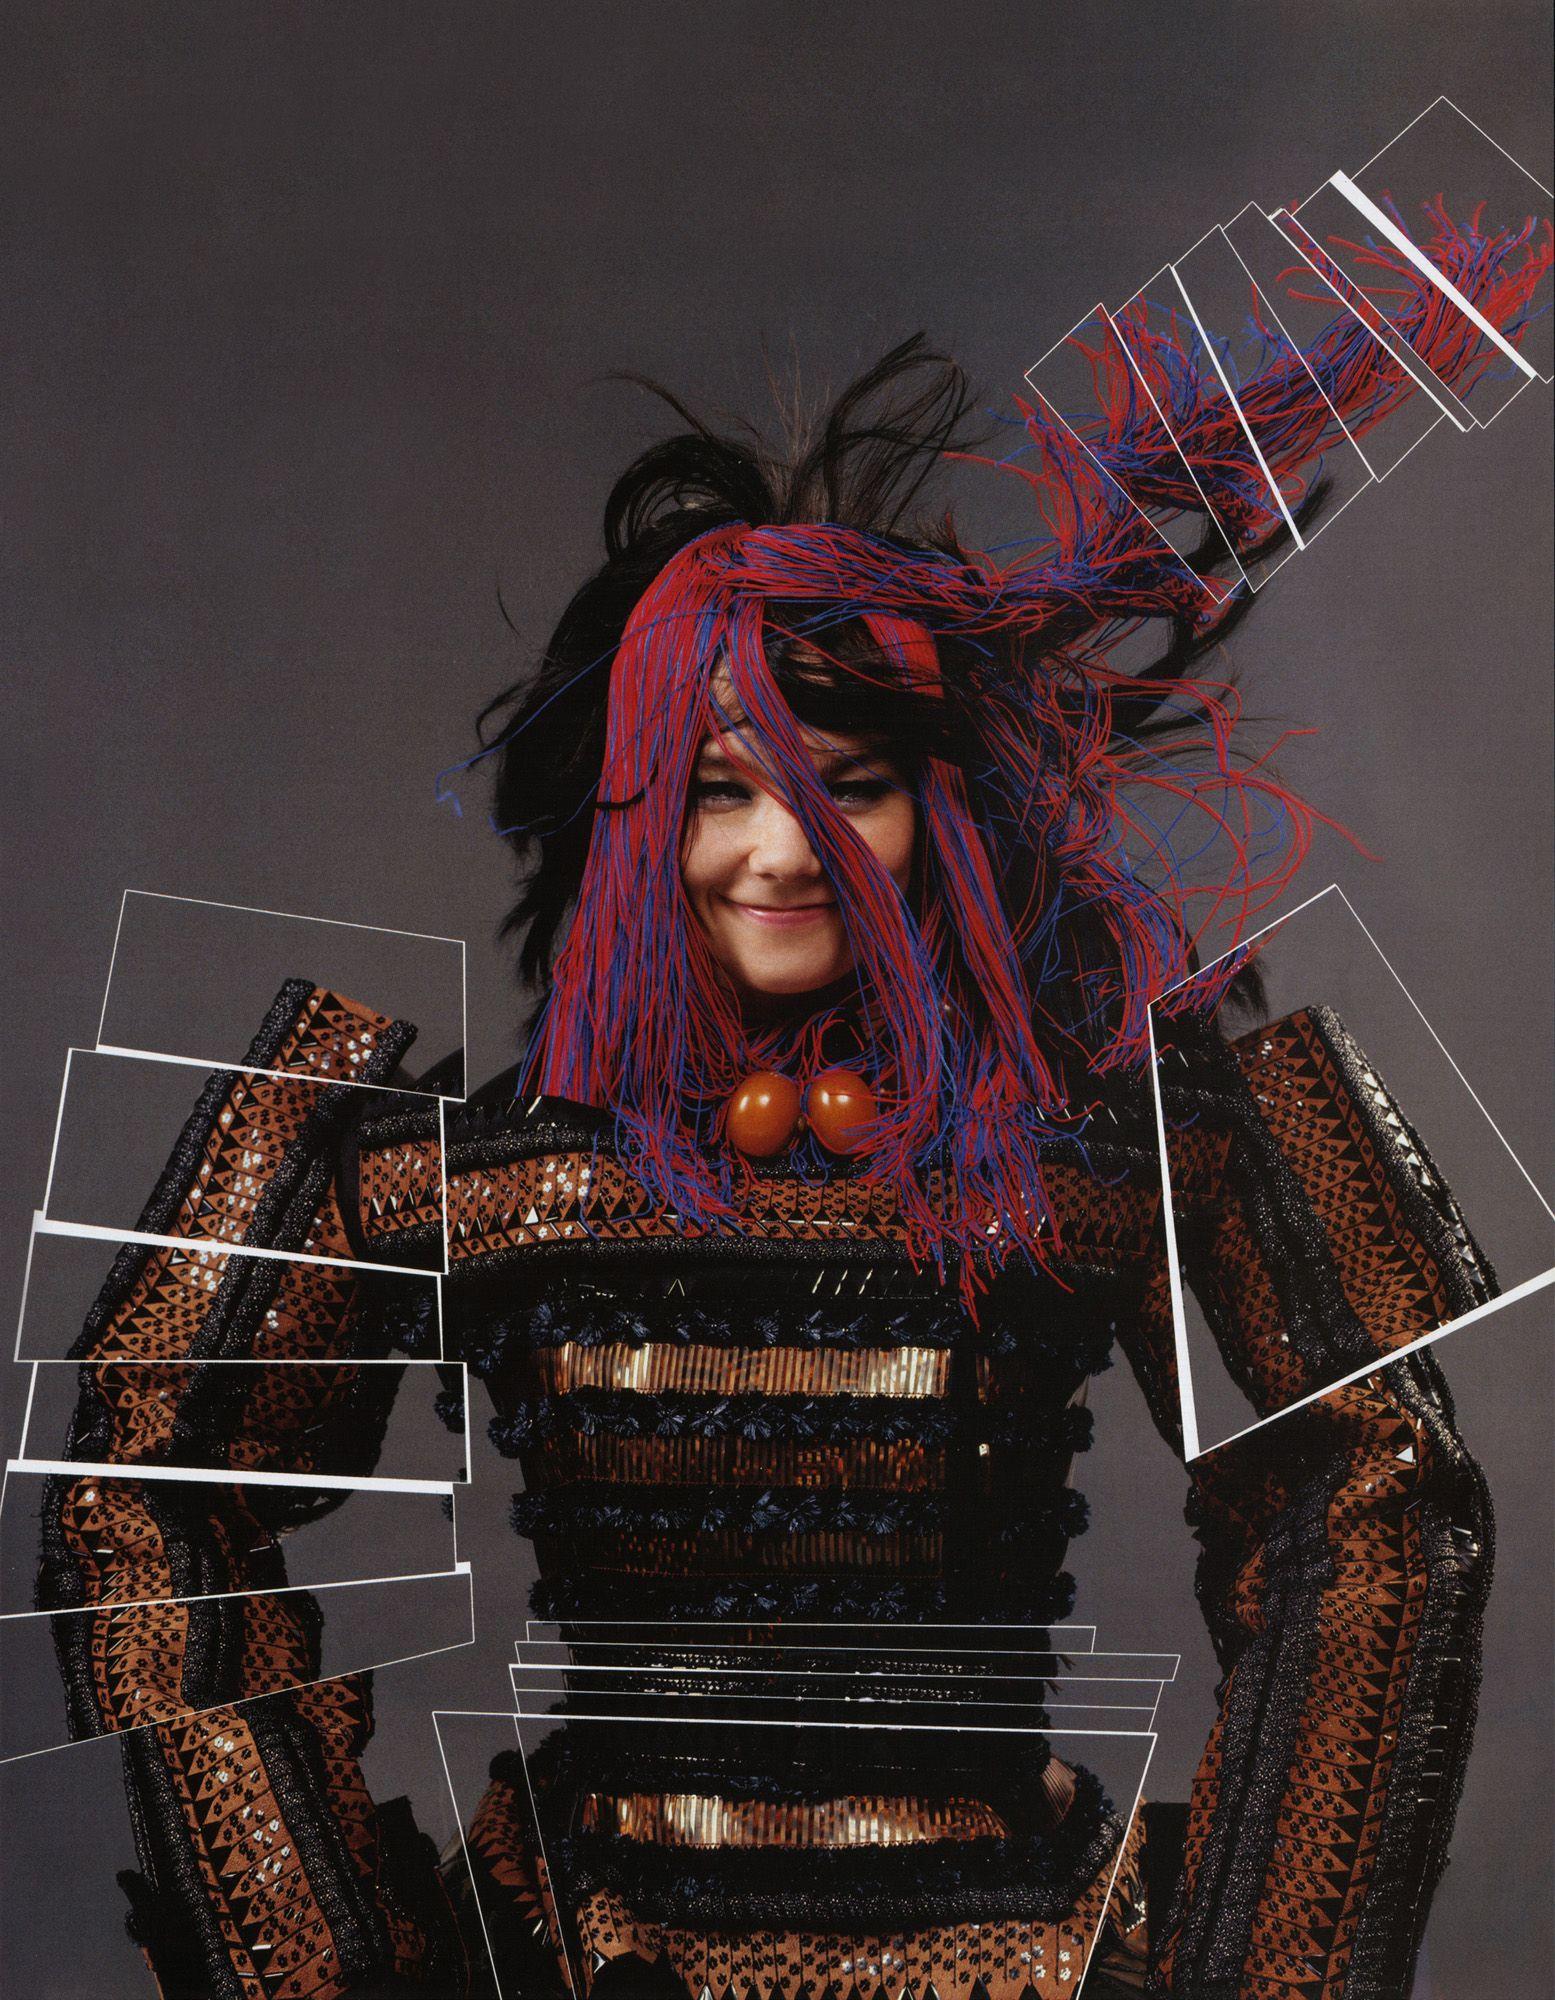 Björk by Jean-Paul Goude #2007 dressed by John Galliano